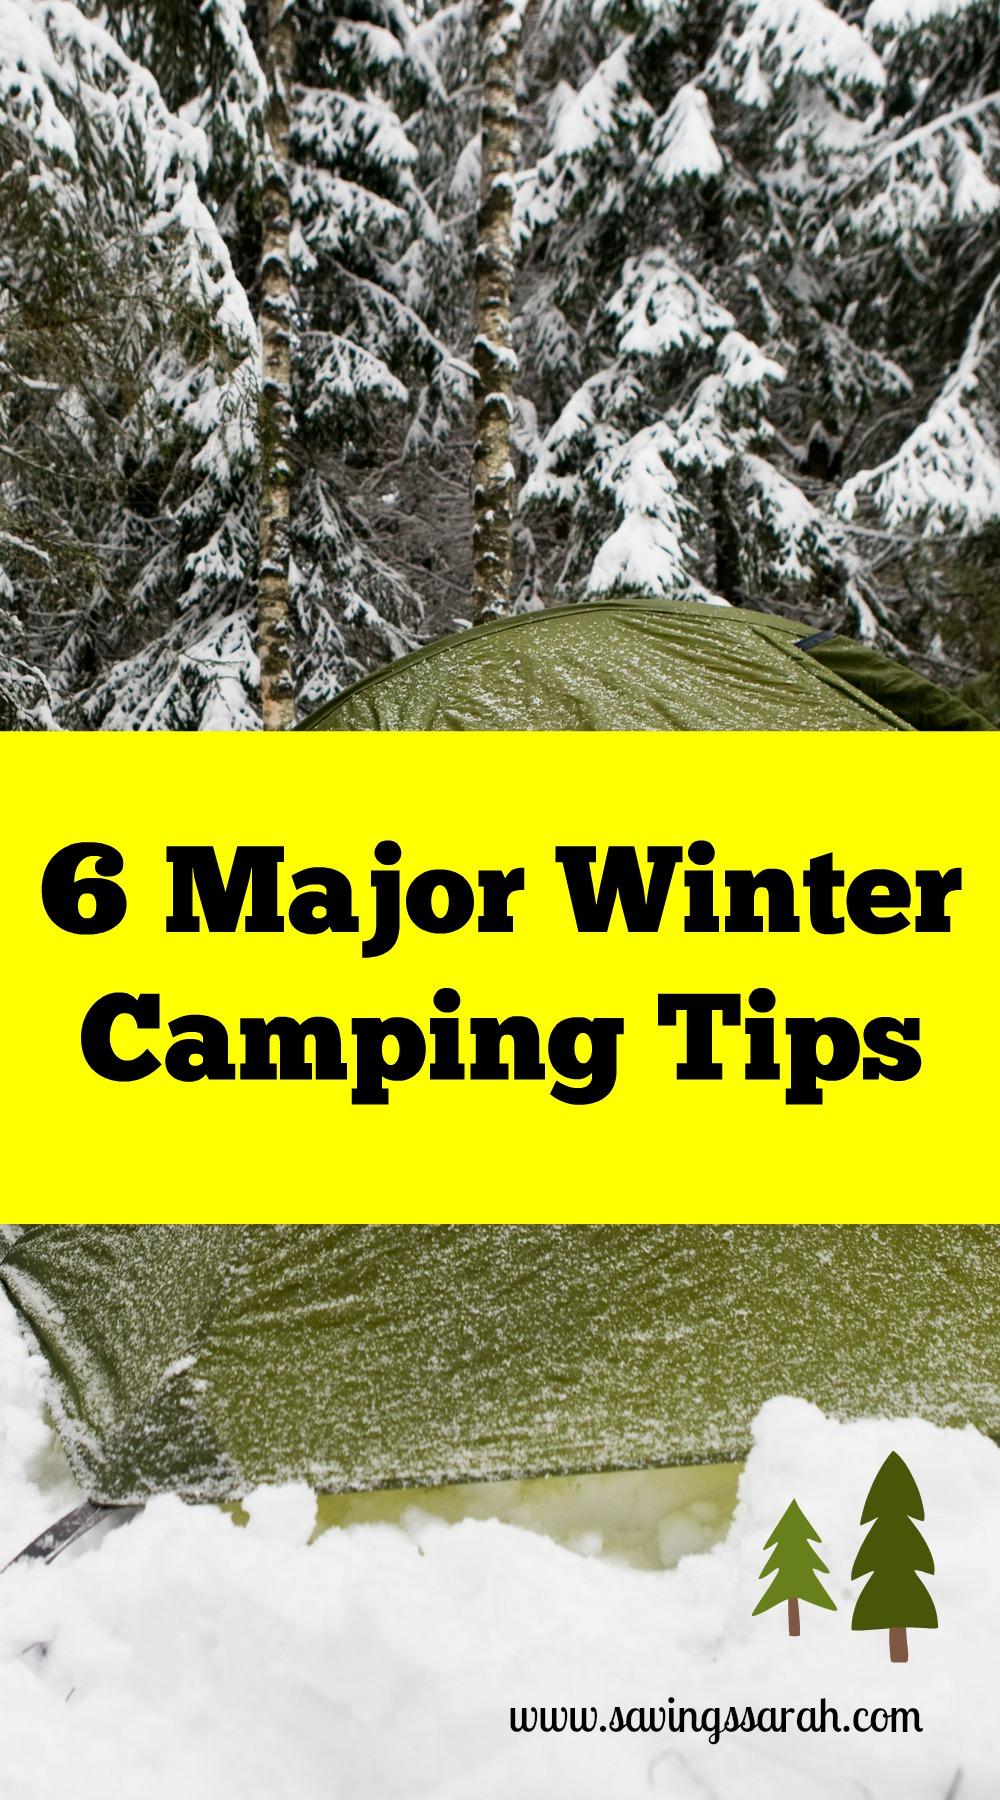 6 Major Winter Camping Tips - Earning and Saving with Sarah